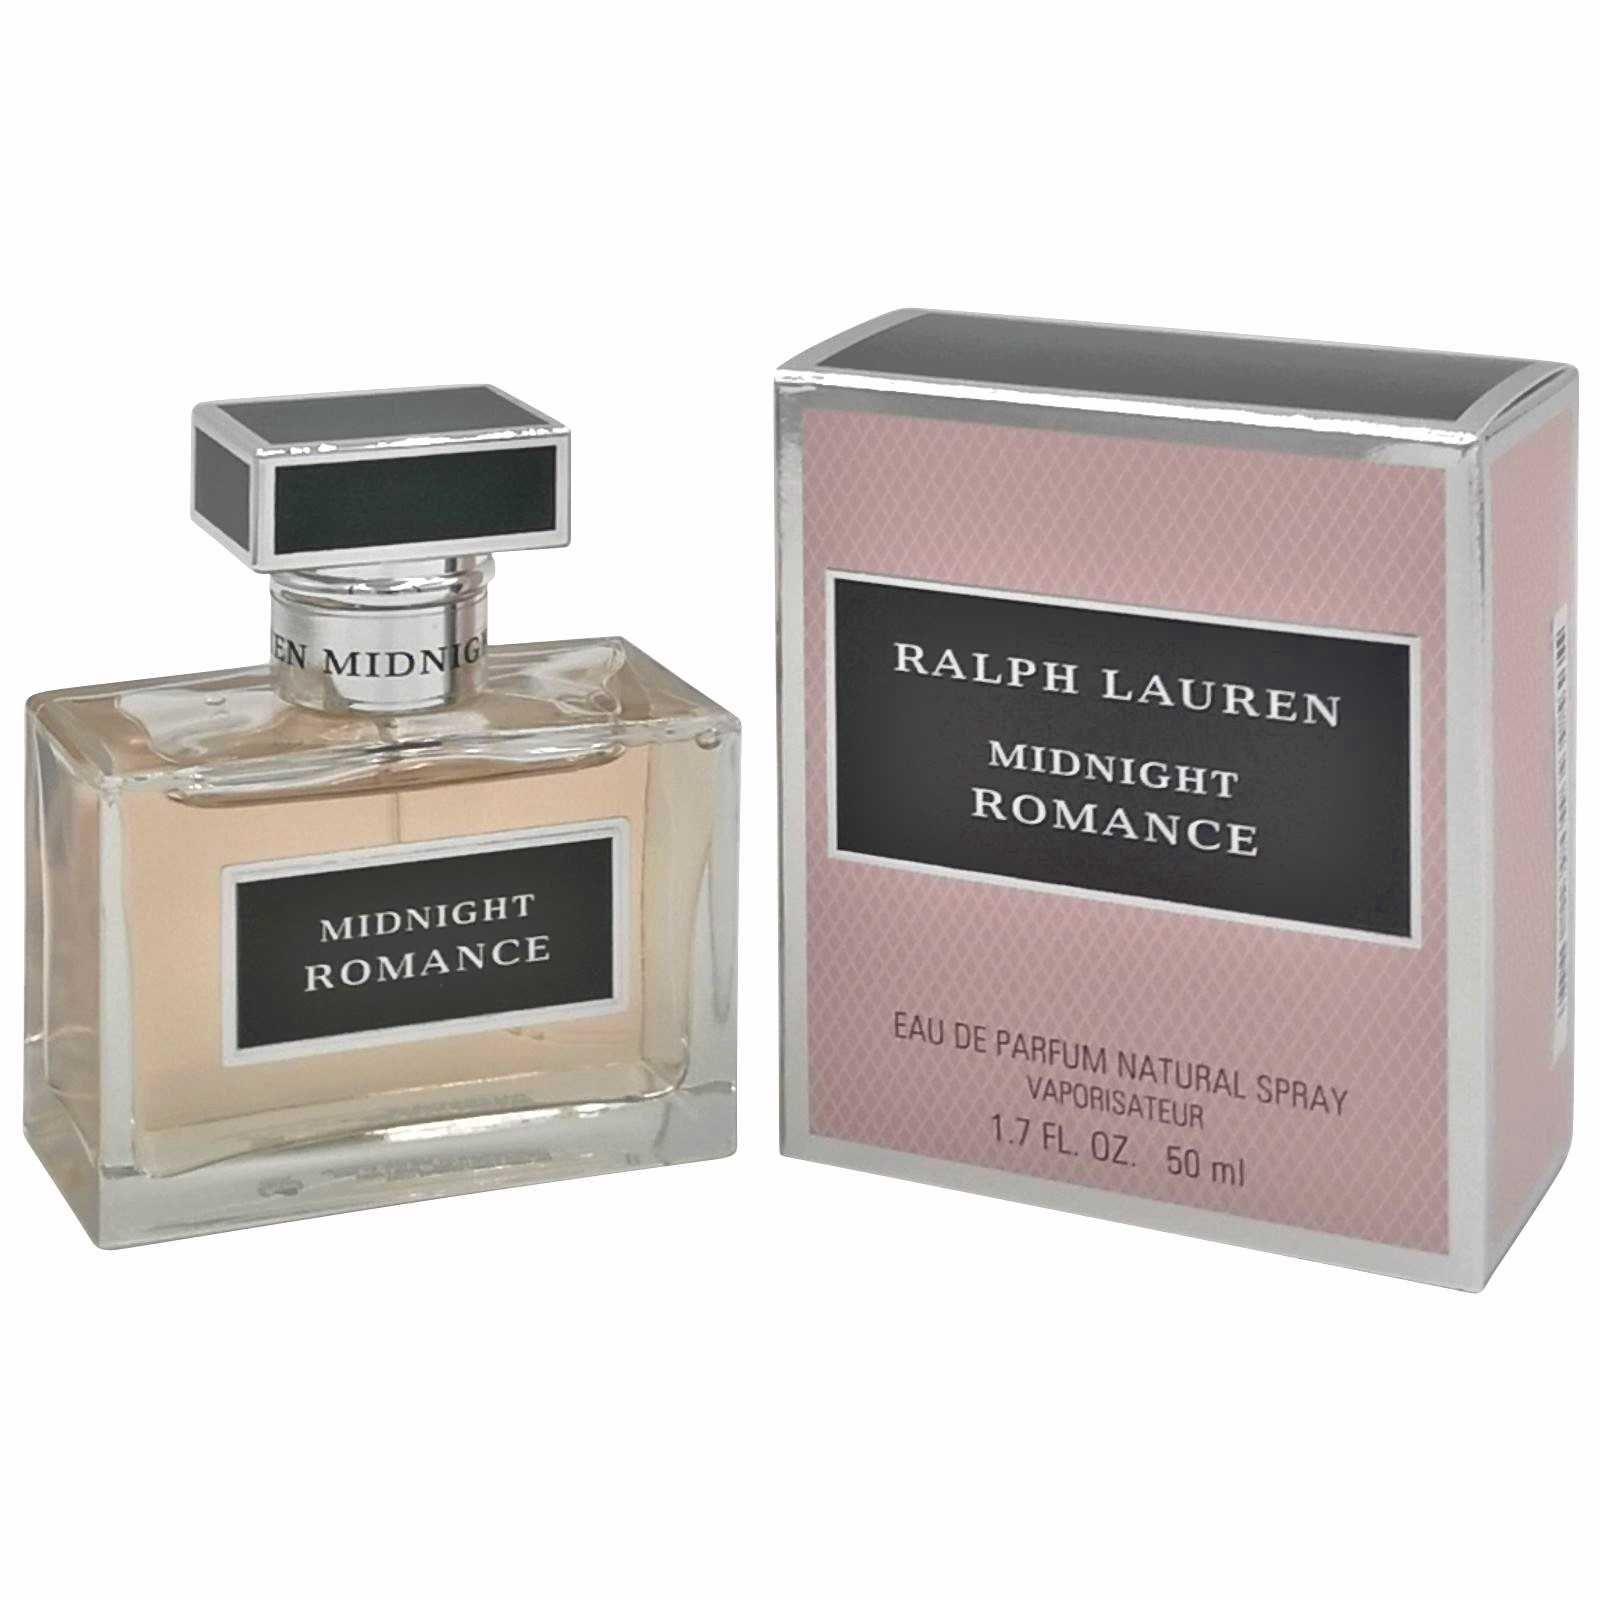 Perfumy | Ralph Lauren | Romance Midnight | 50 ml | edp